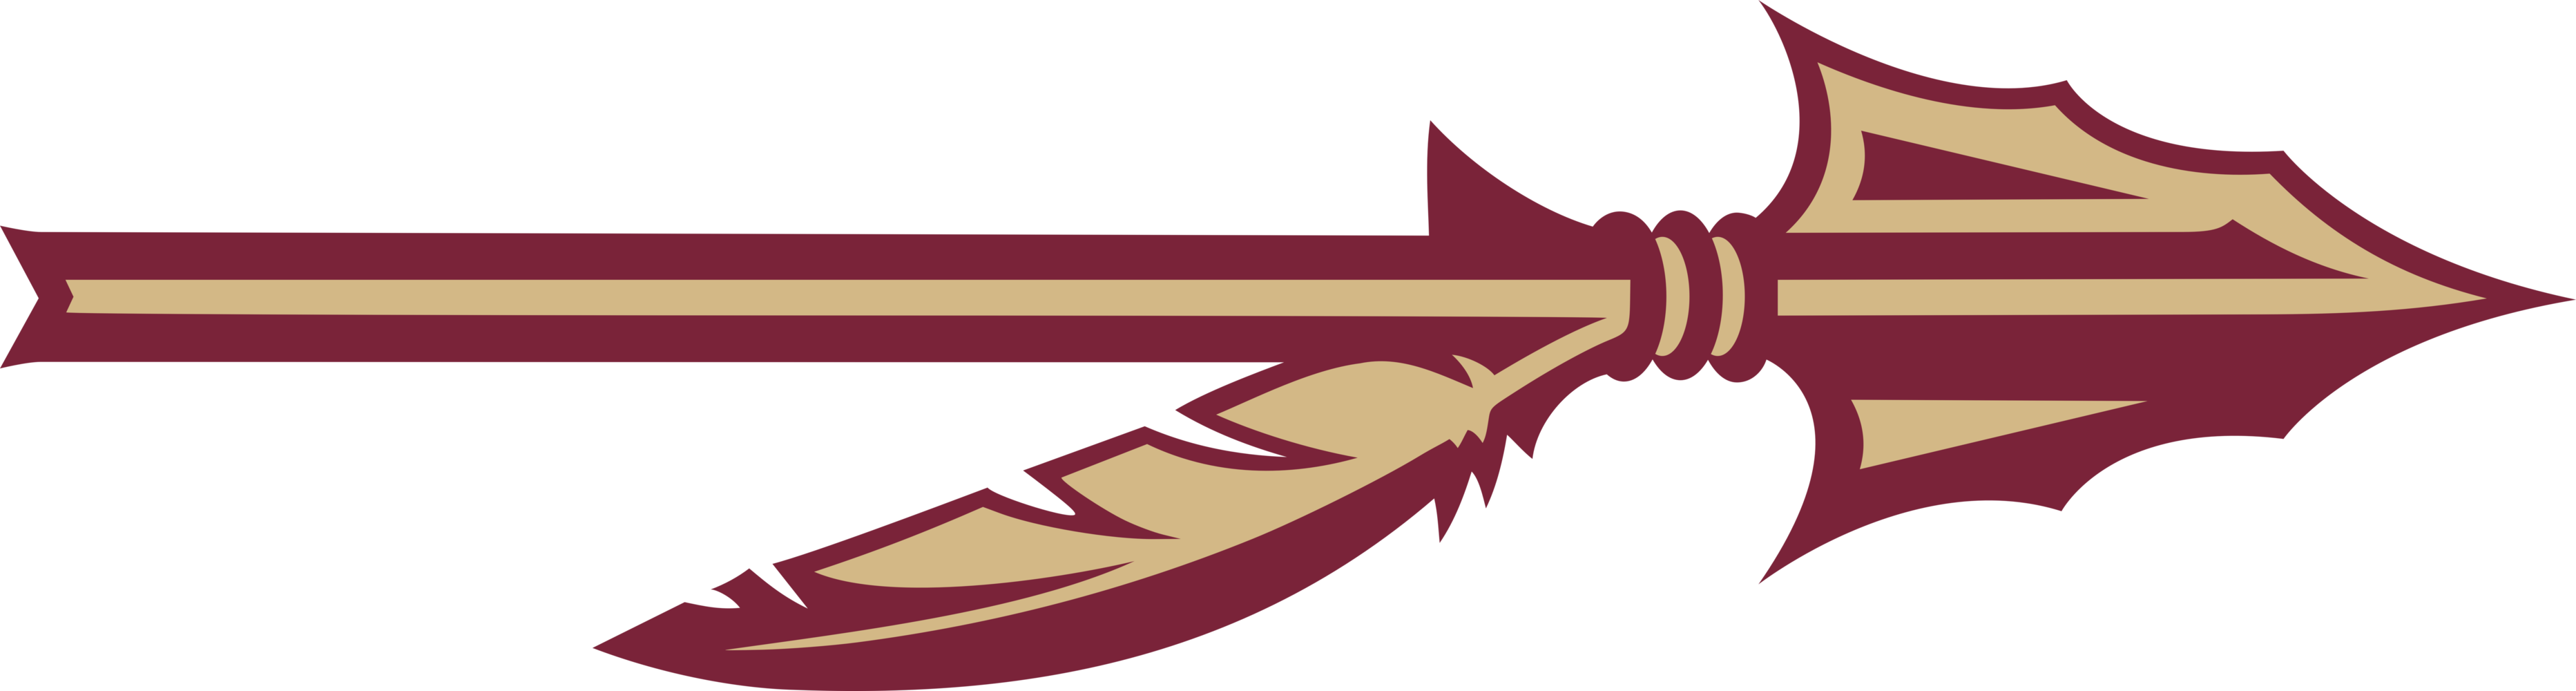 Fsu football clipart svg freeuse download Florida State Seminoles   Team Logos   Pinterest   Tatting svg freeuse download